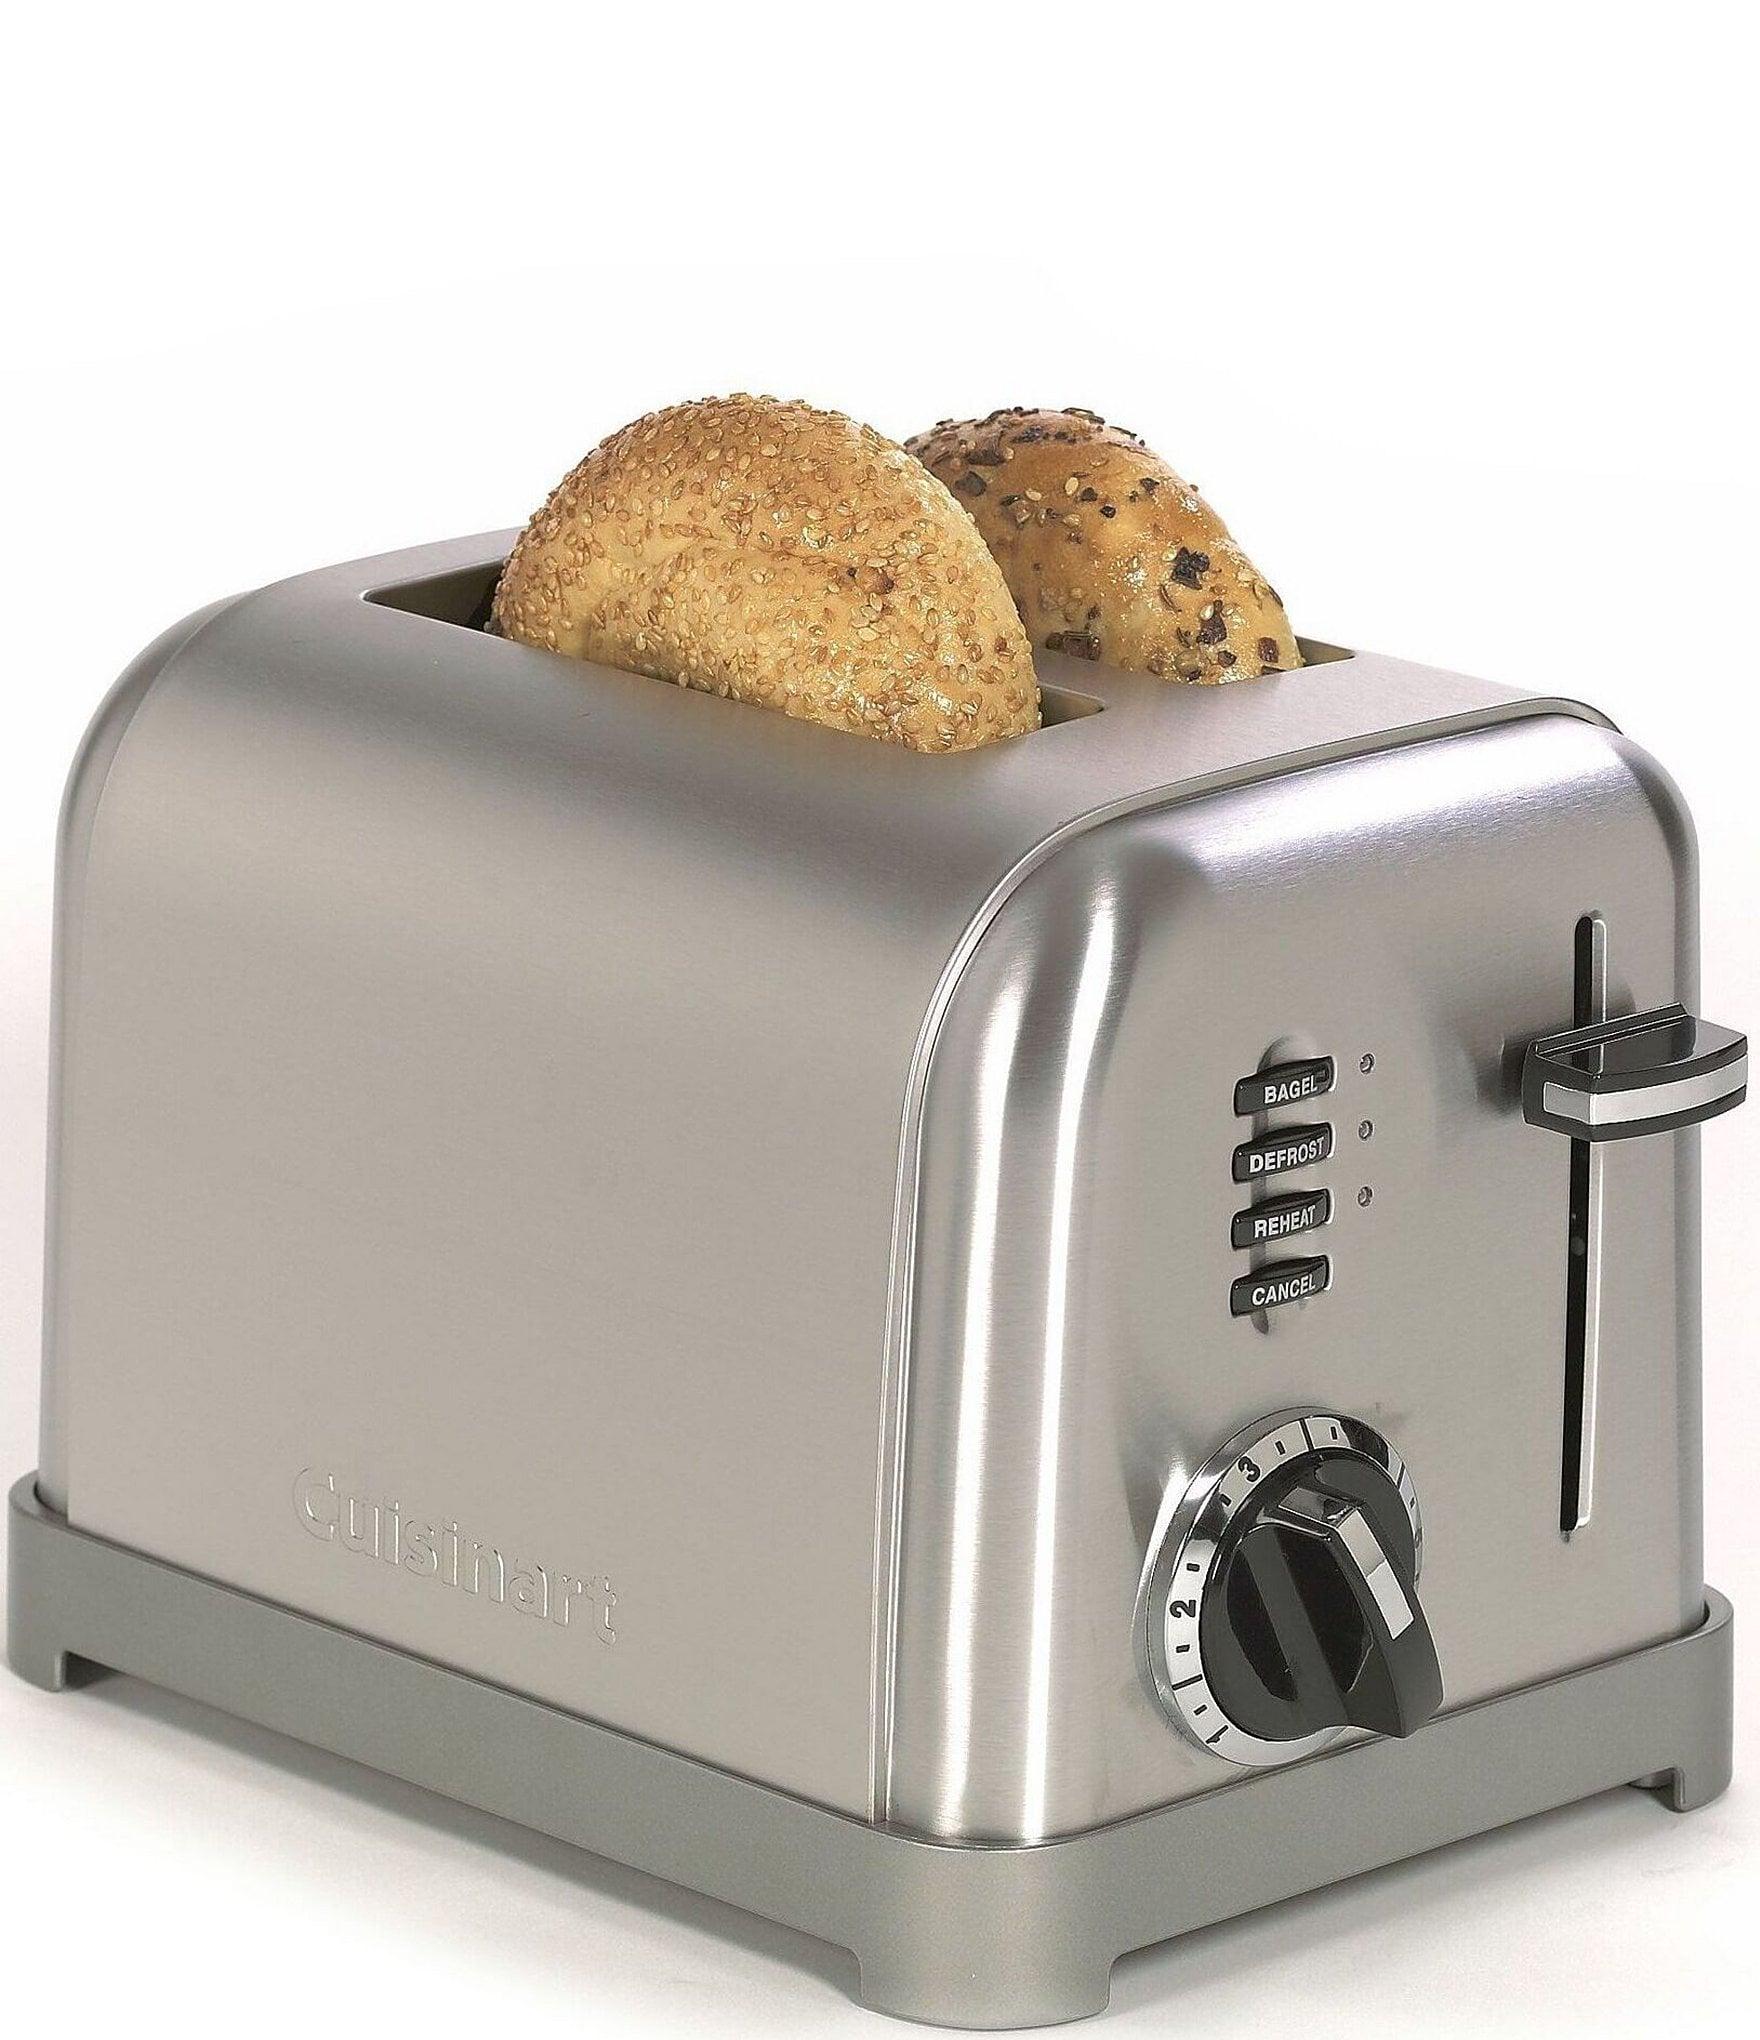 Toasters & Ovens | Dillards